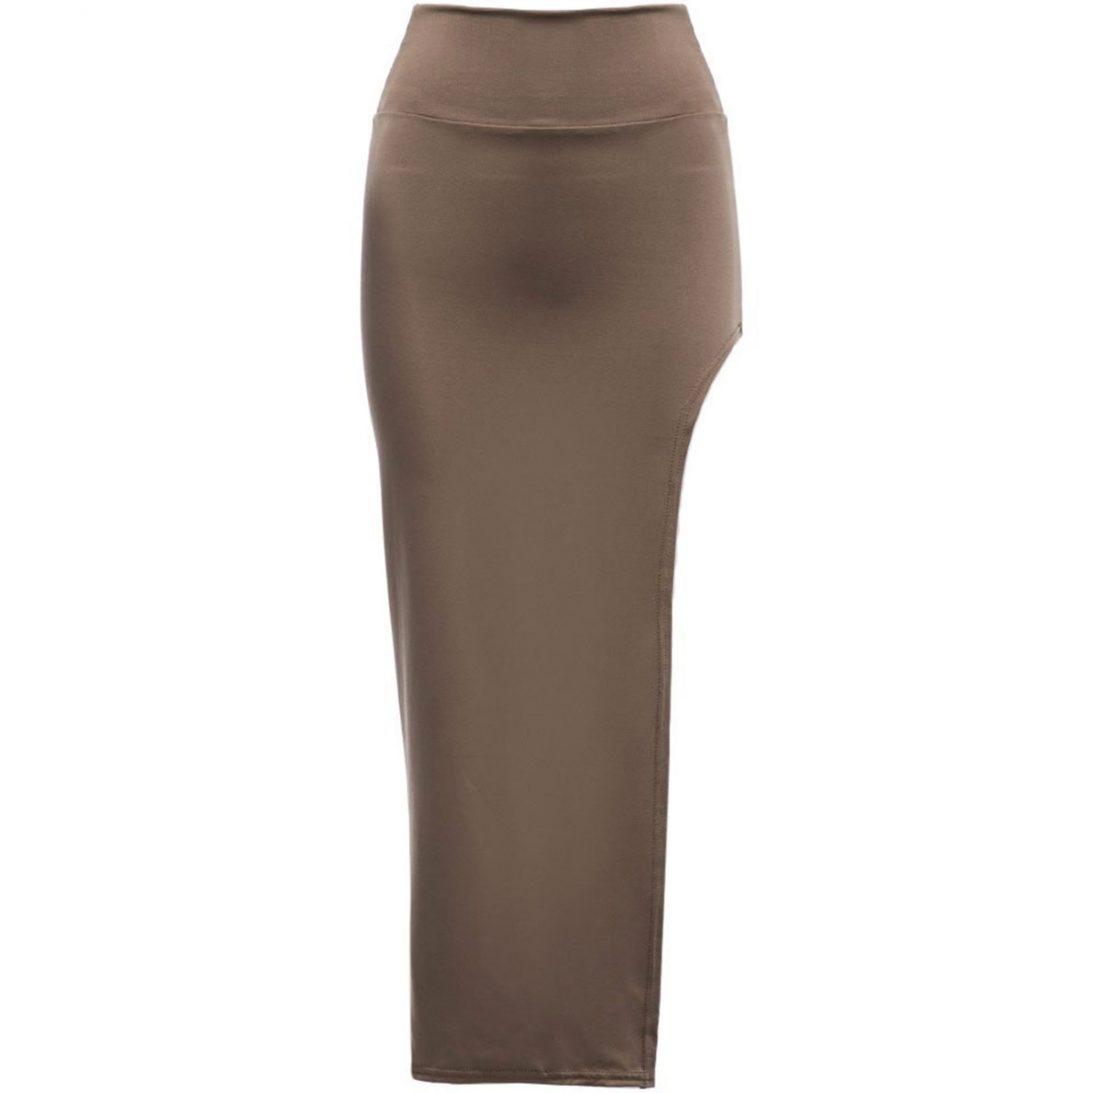 M0182 khaki4 Side Split Skirts maureens.com boutique